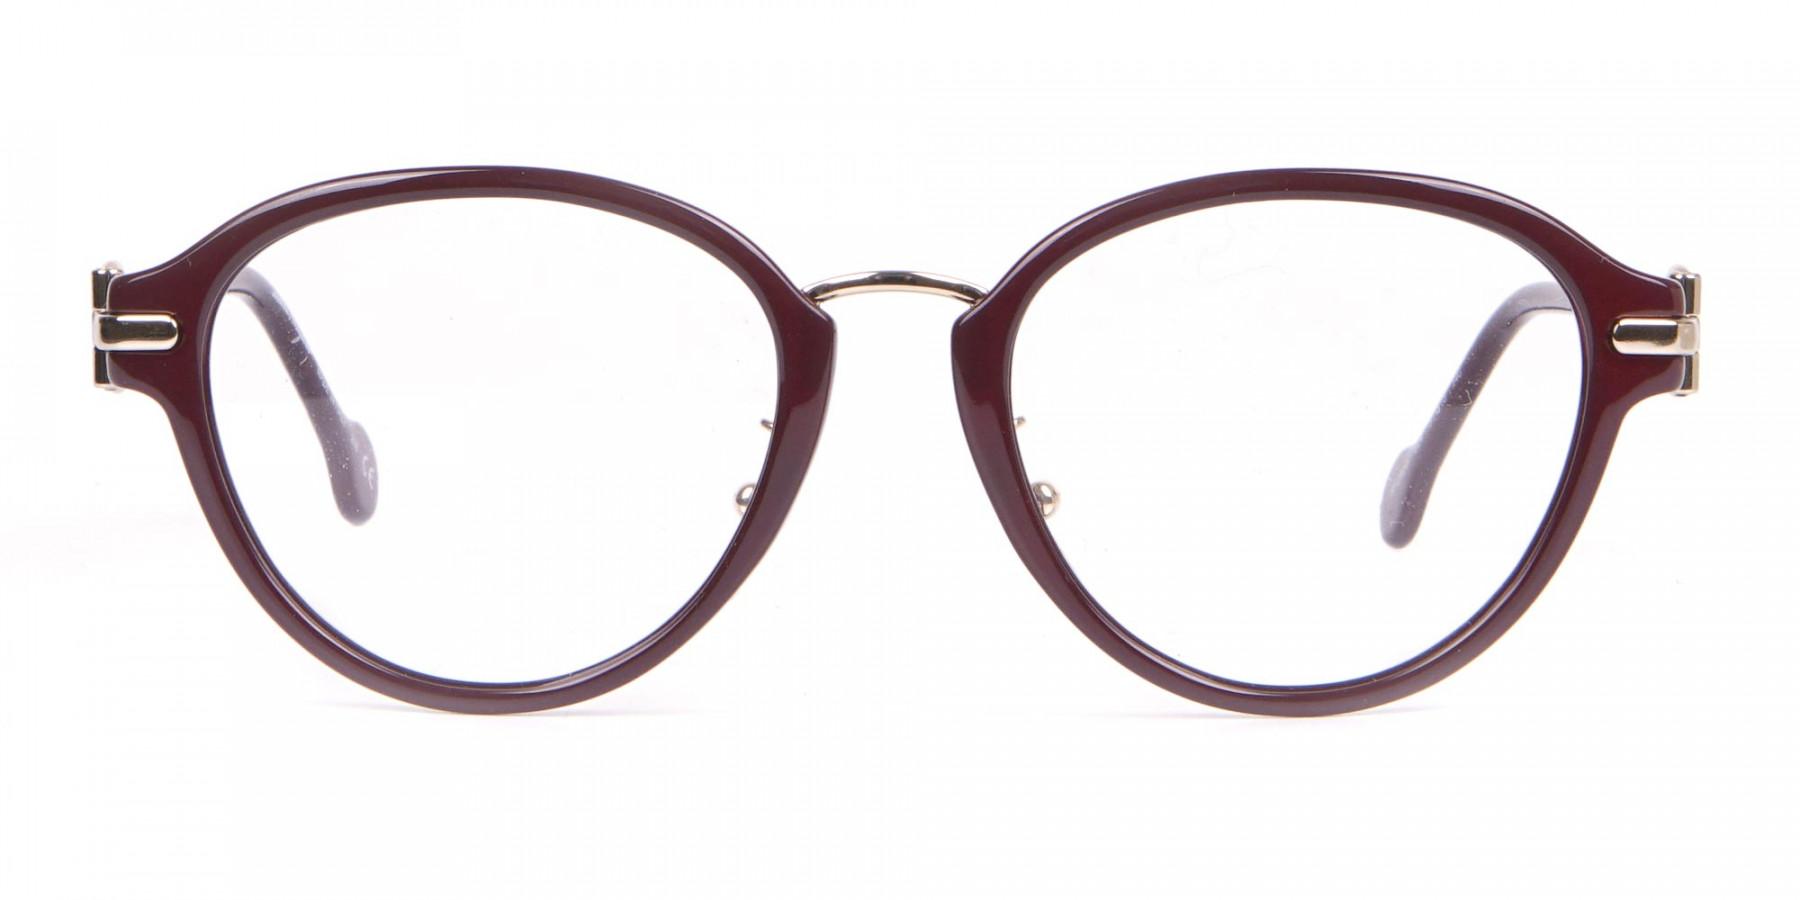 Salvatore Ferragamo SF2826 Women Round Glasses Burgundy-1